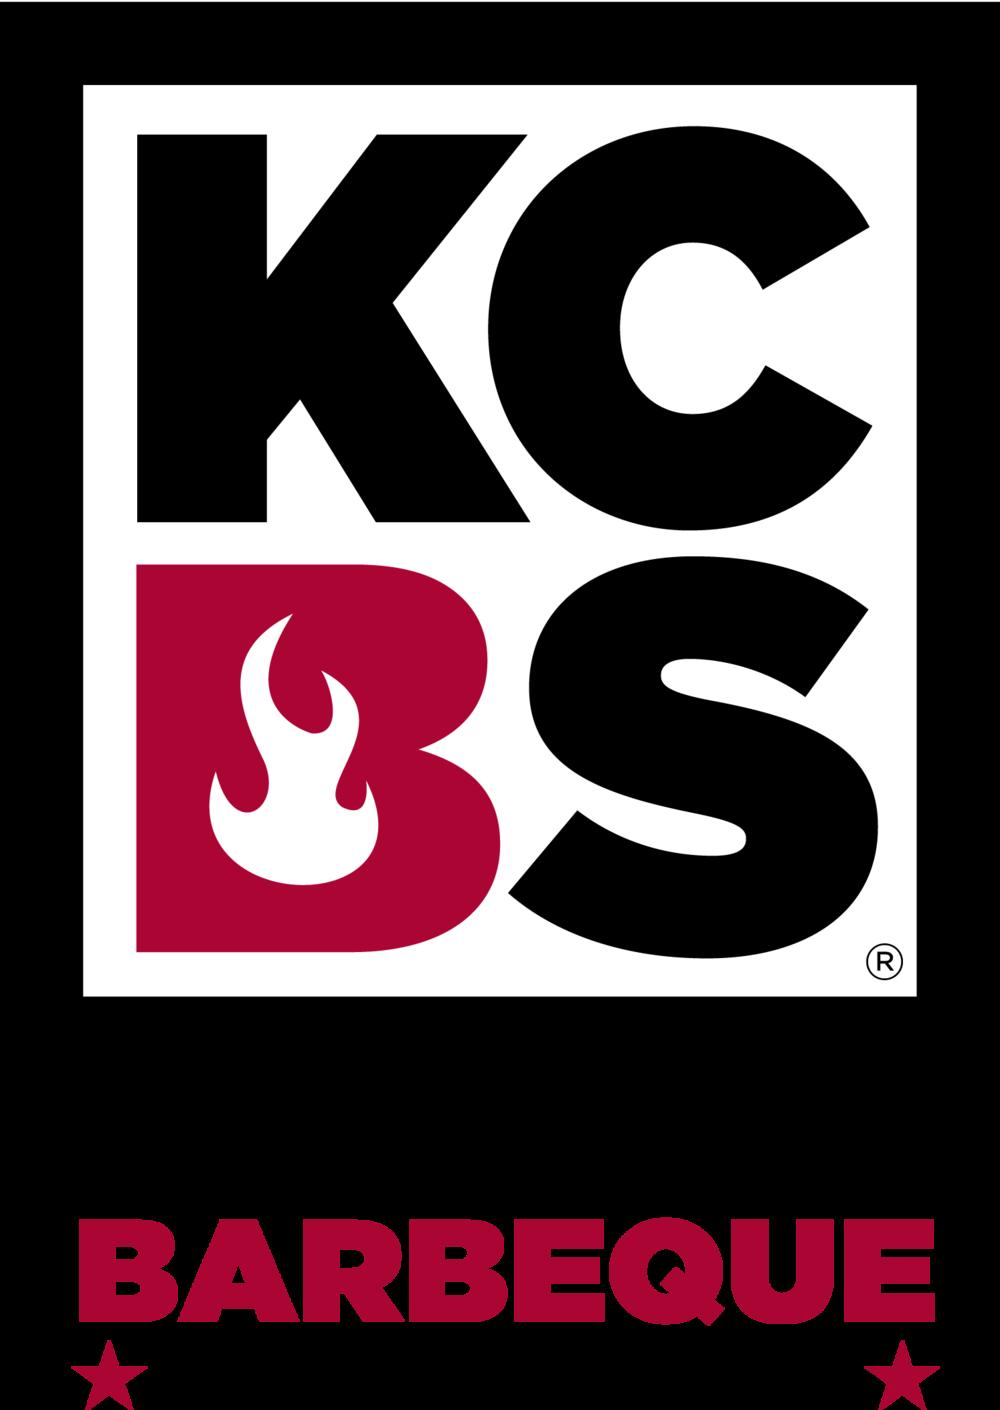 KCBS_Logo_LowRes.png